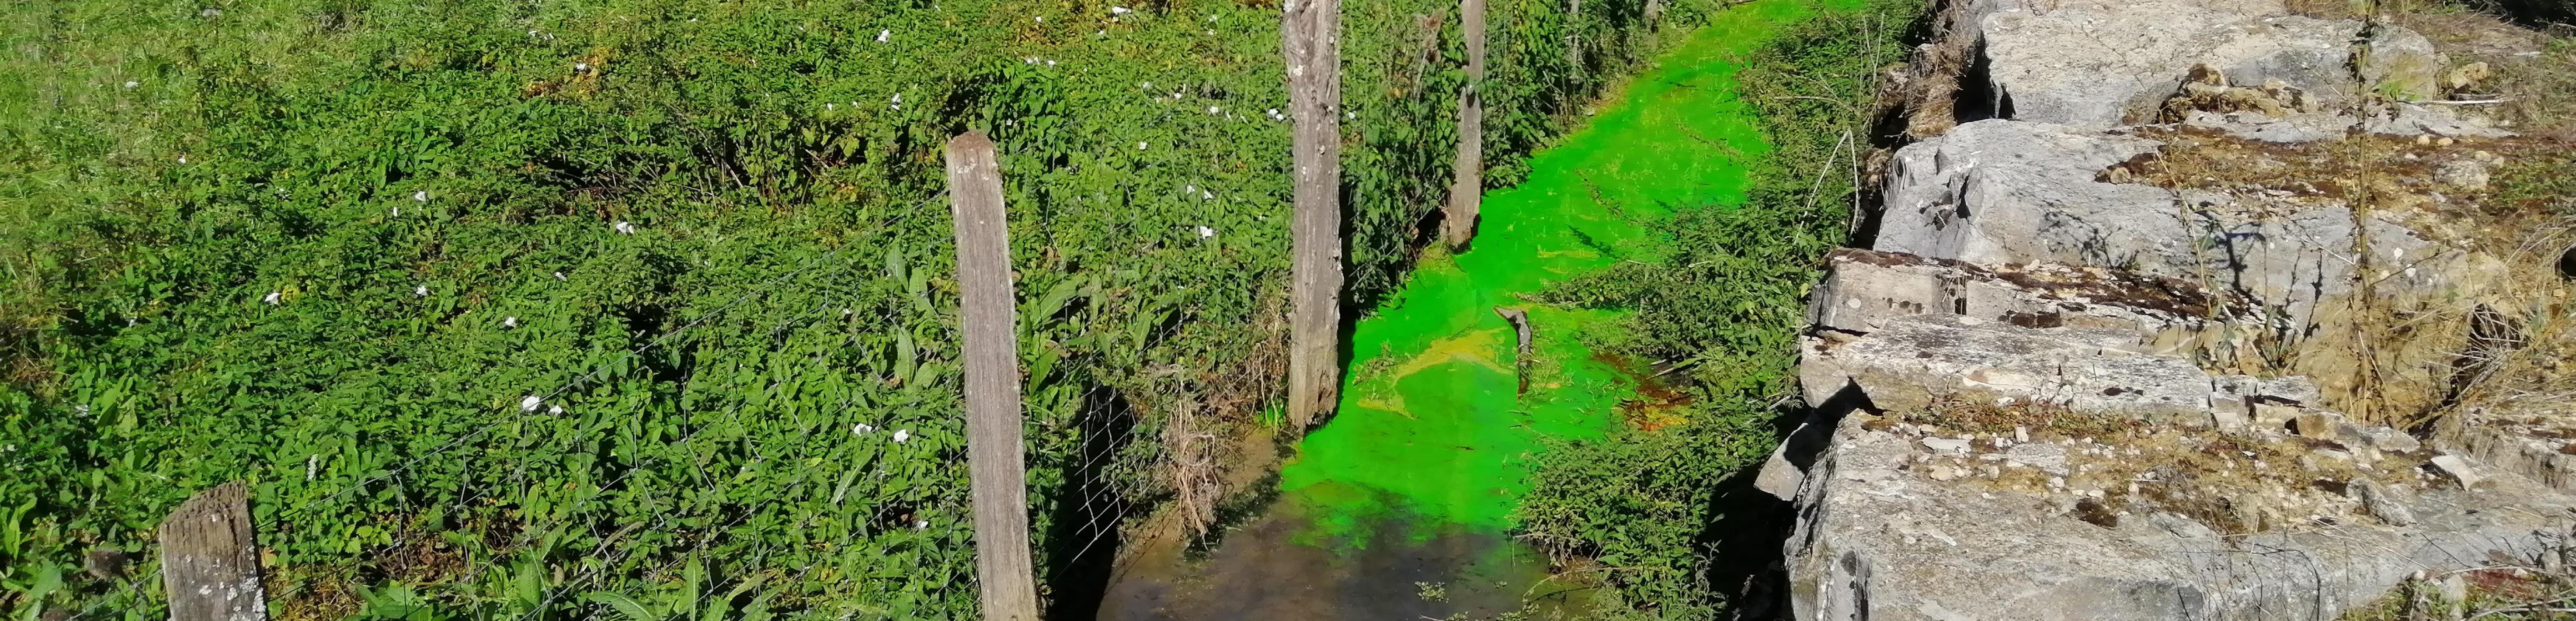 2020 Hydrogéologie traçage Calligée Aveyron